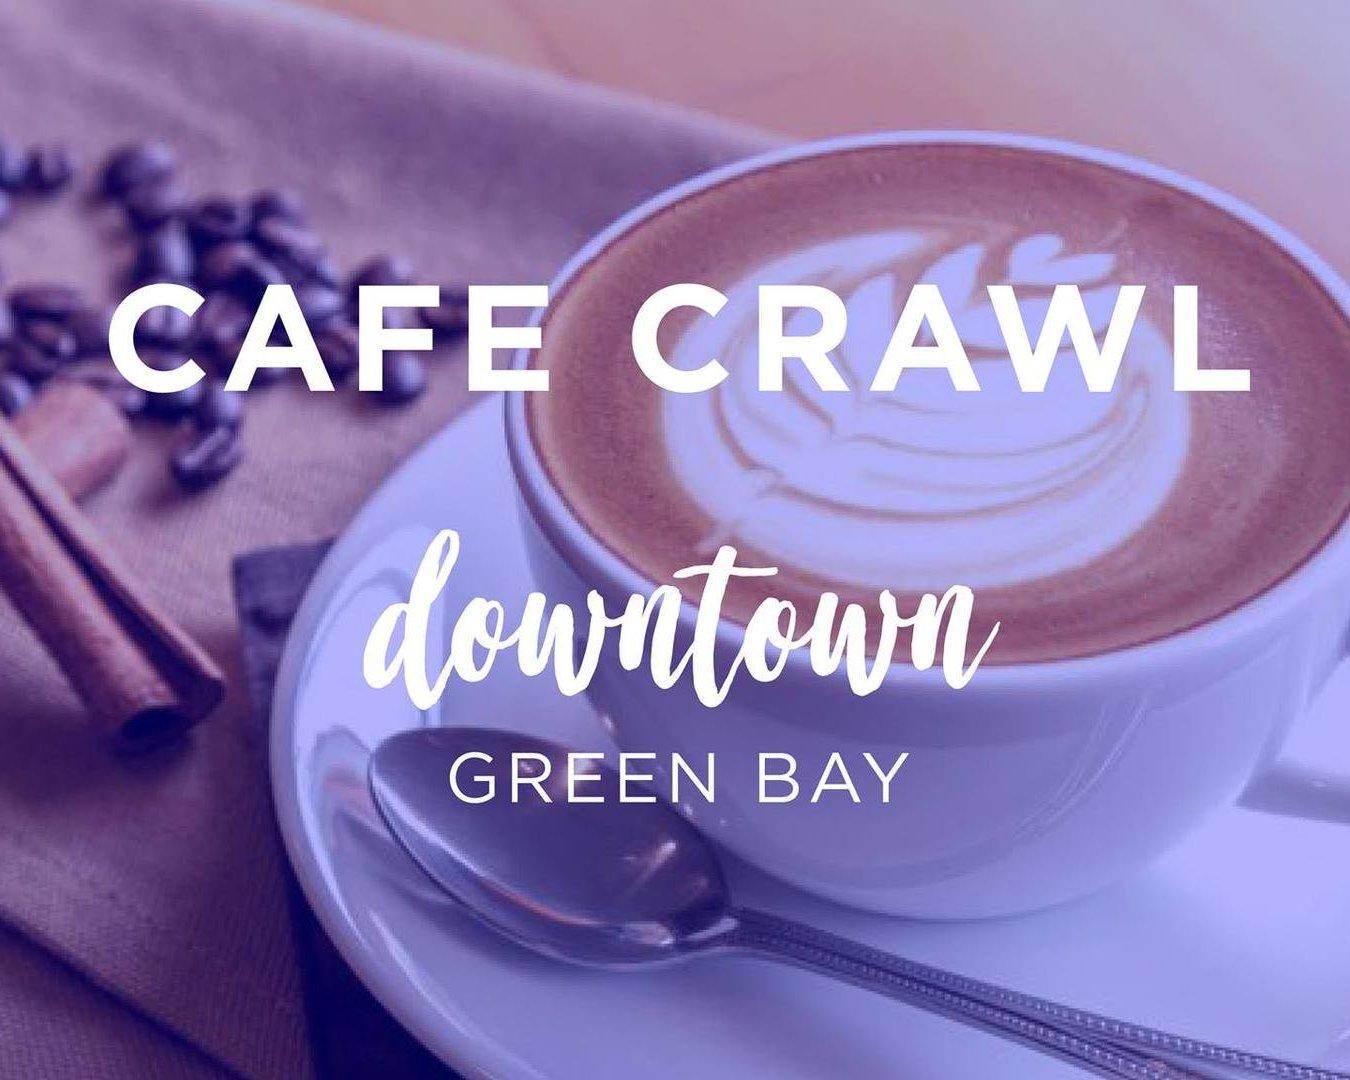 Cafe Crawl Downtown Green Bay